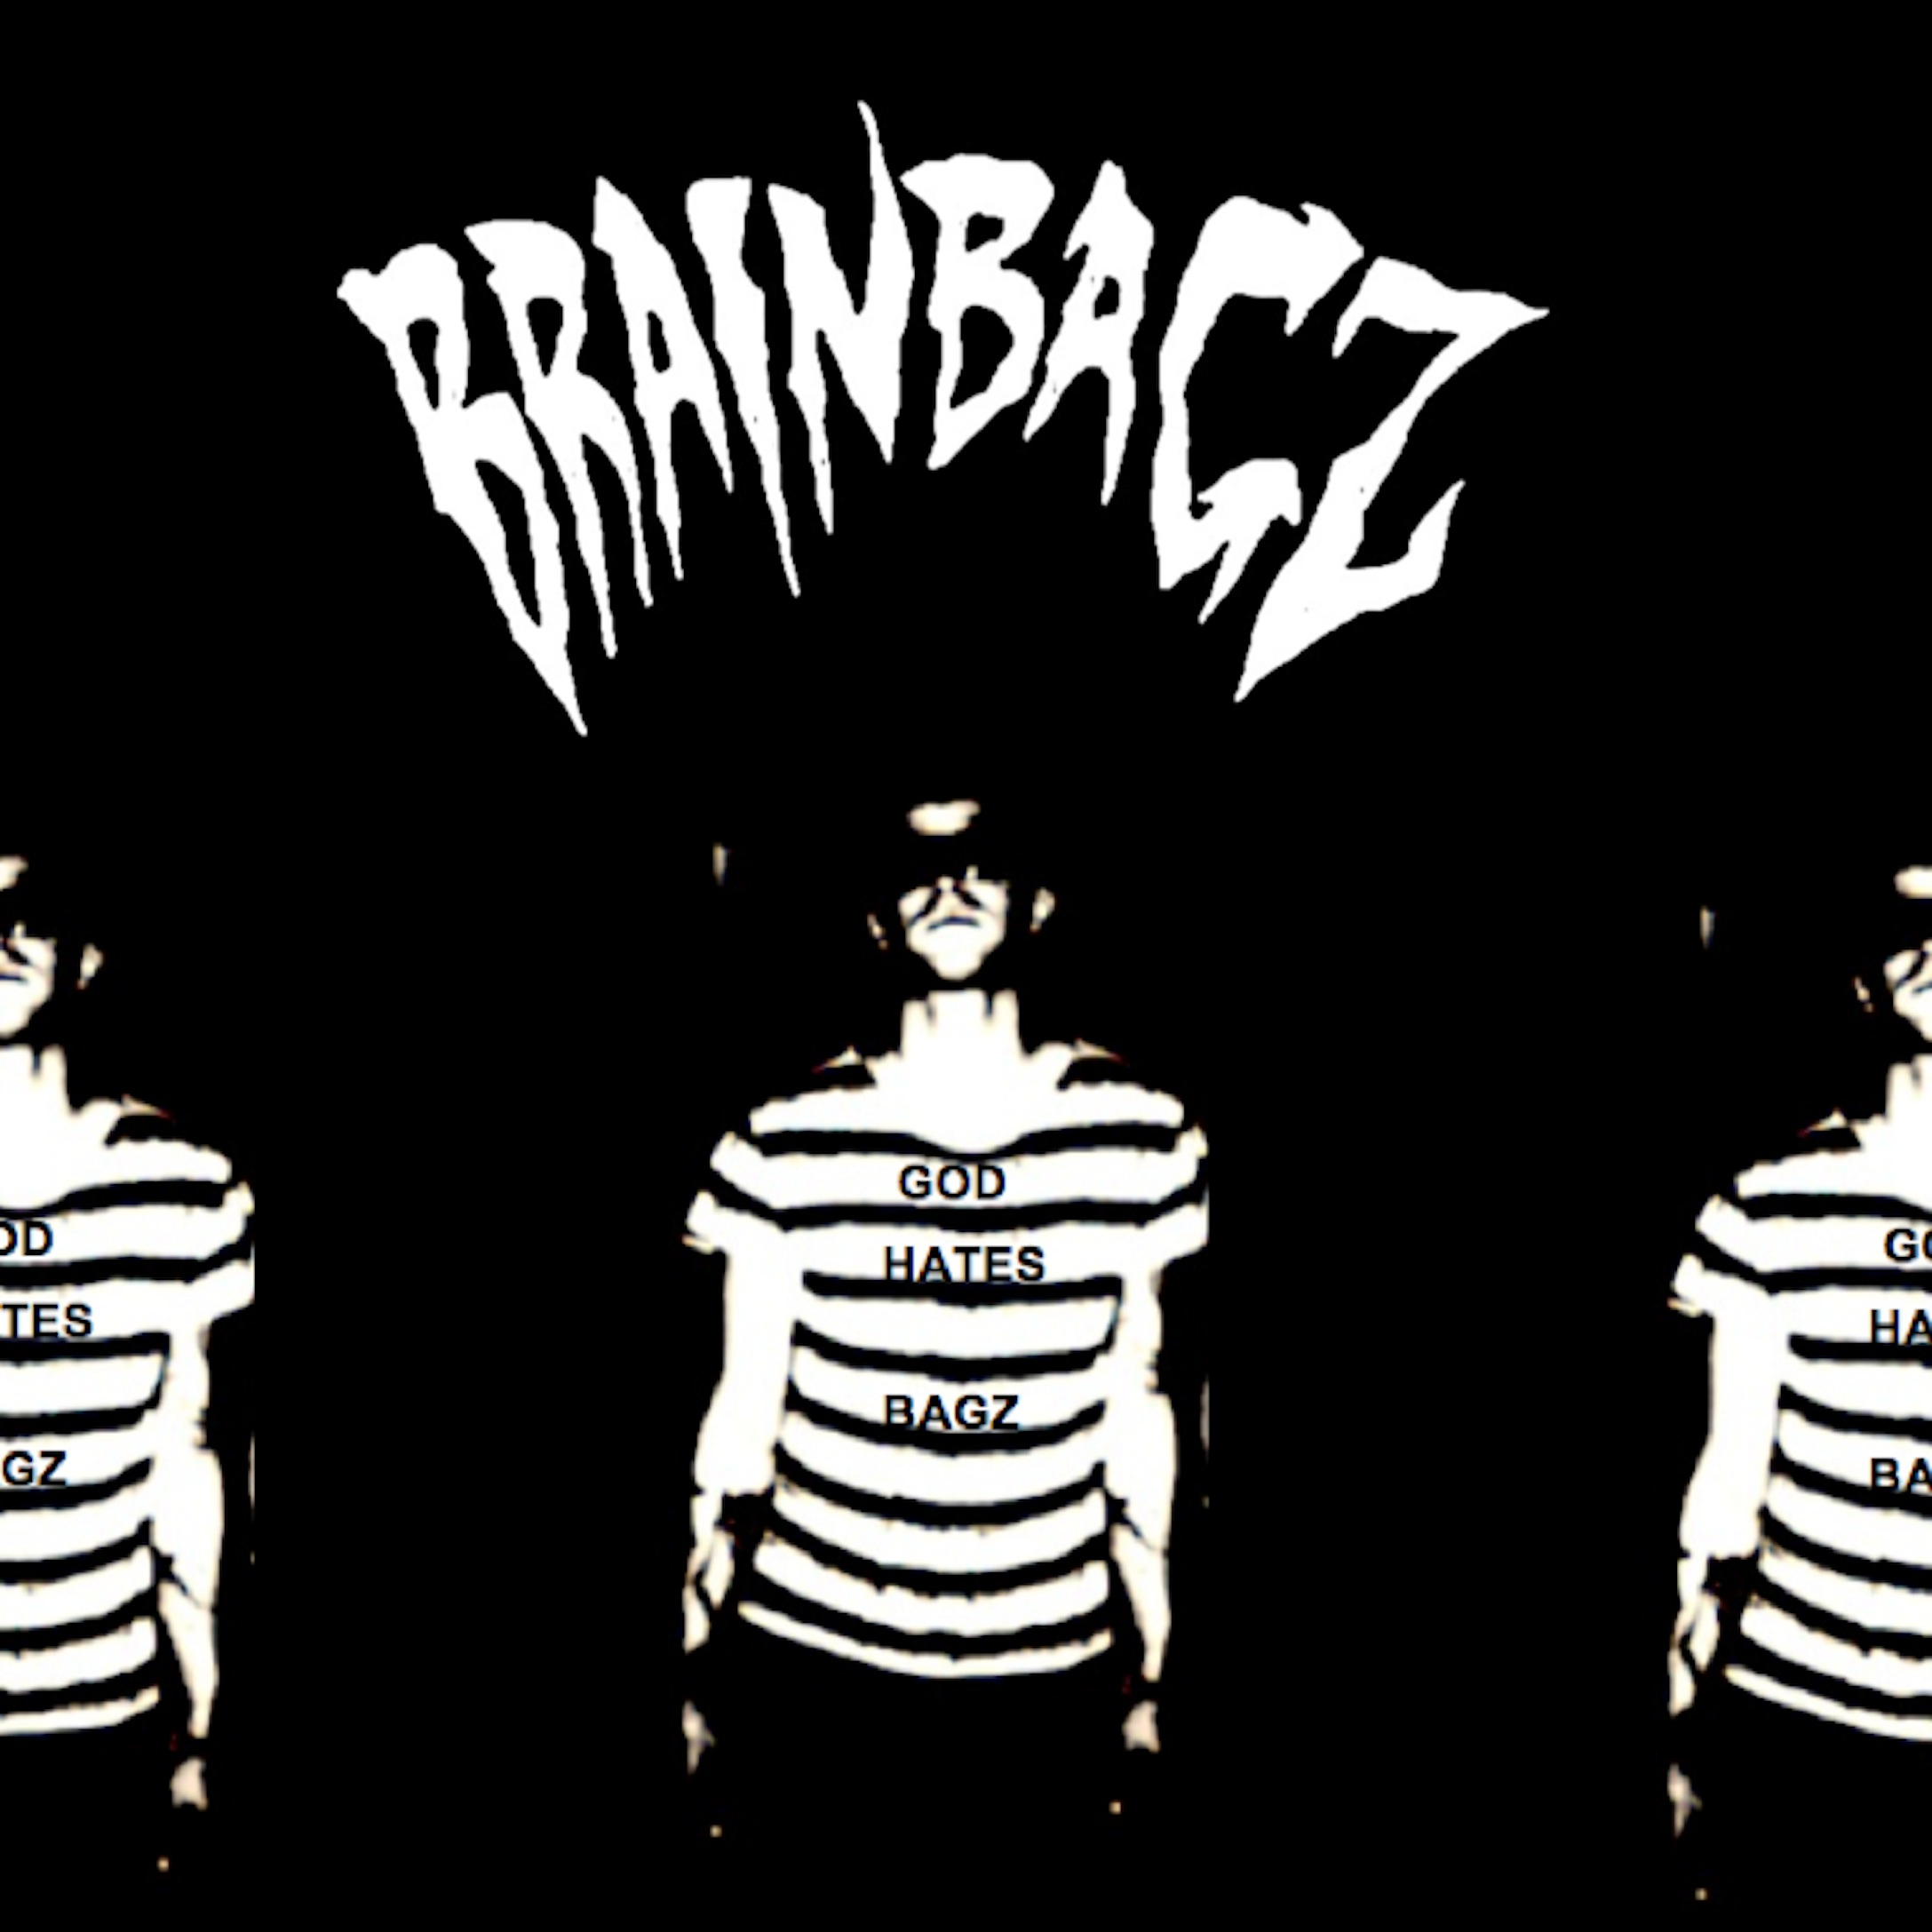 BRAIN BAGZ | God hates BAGZ | Sex Tape Records